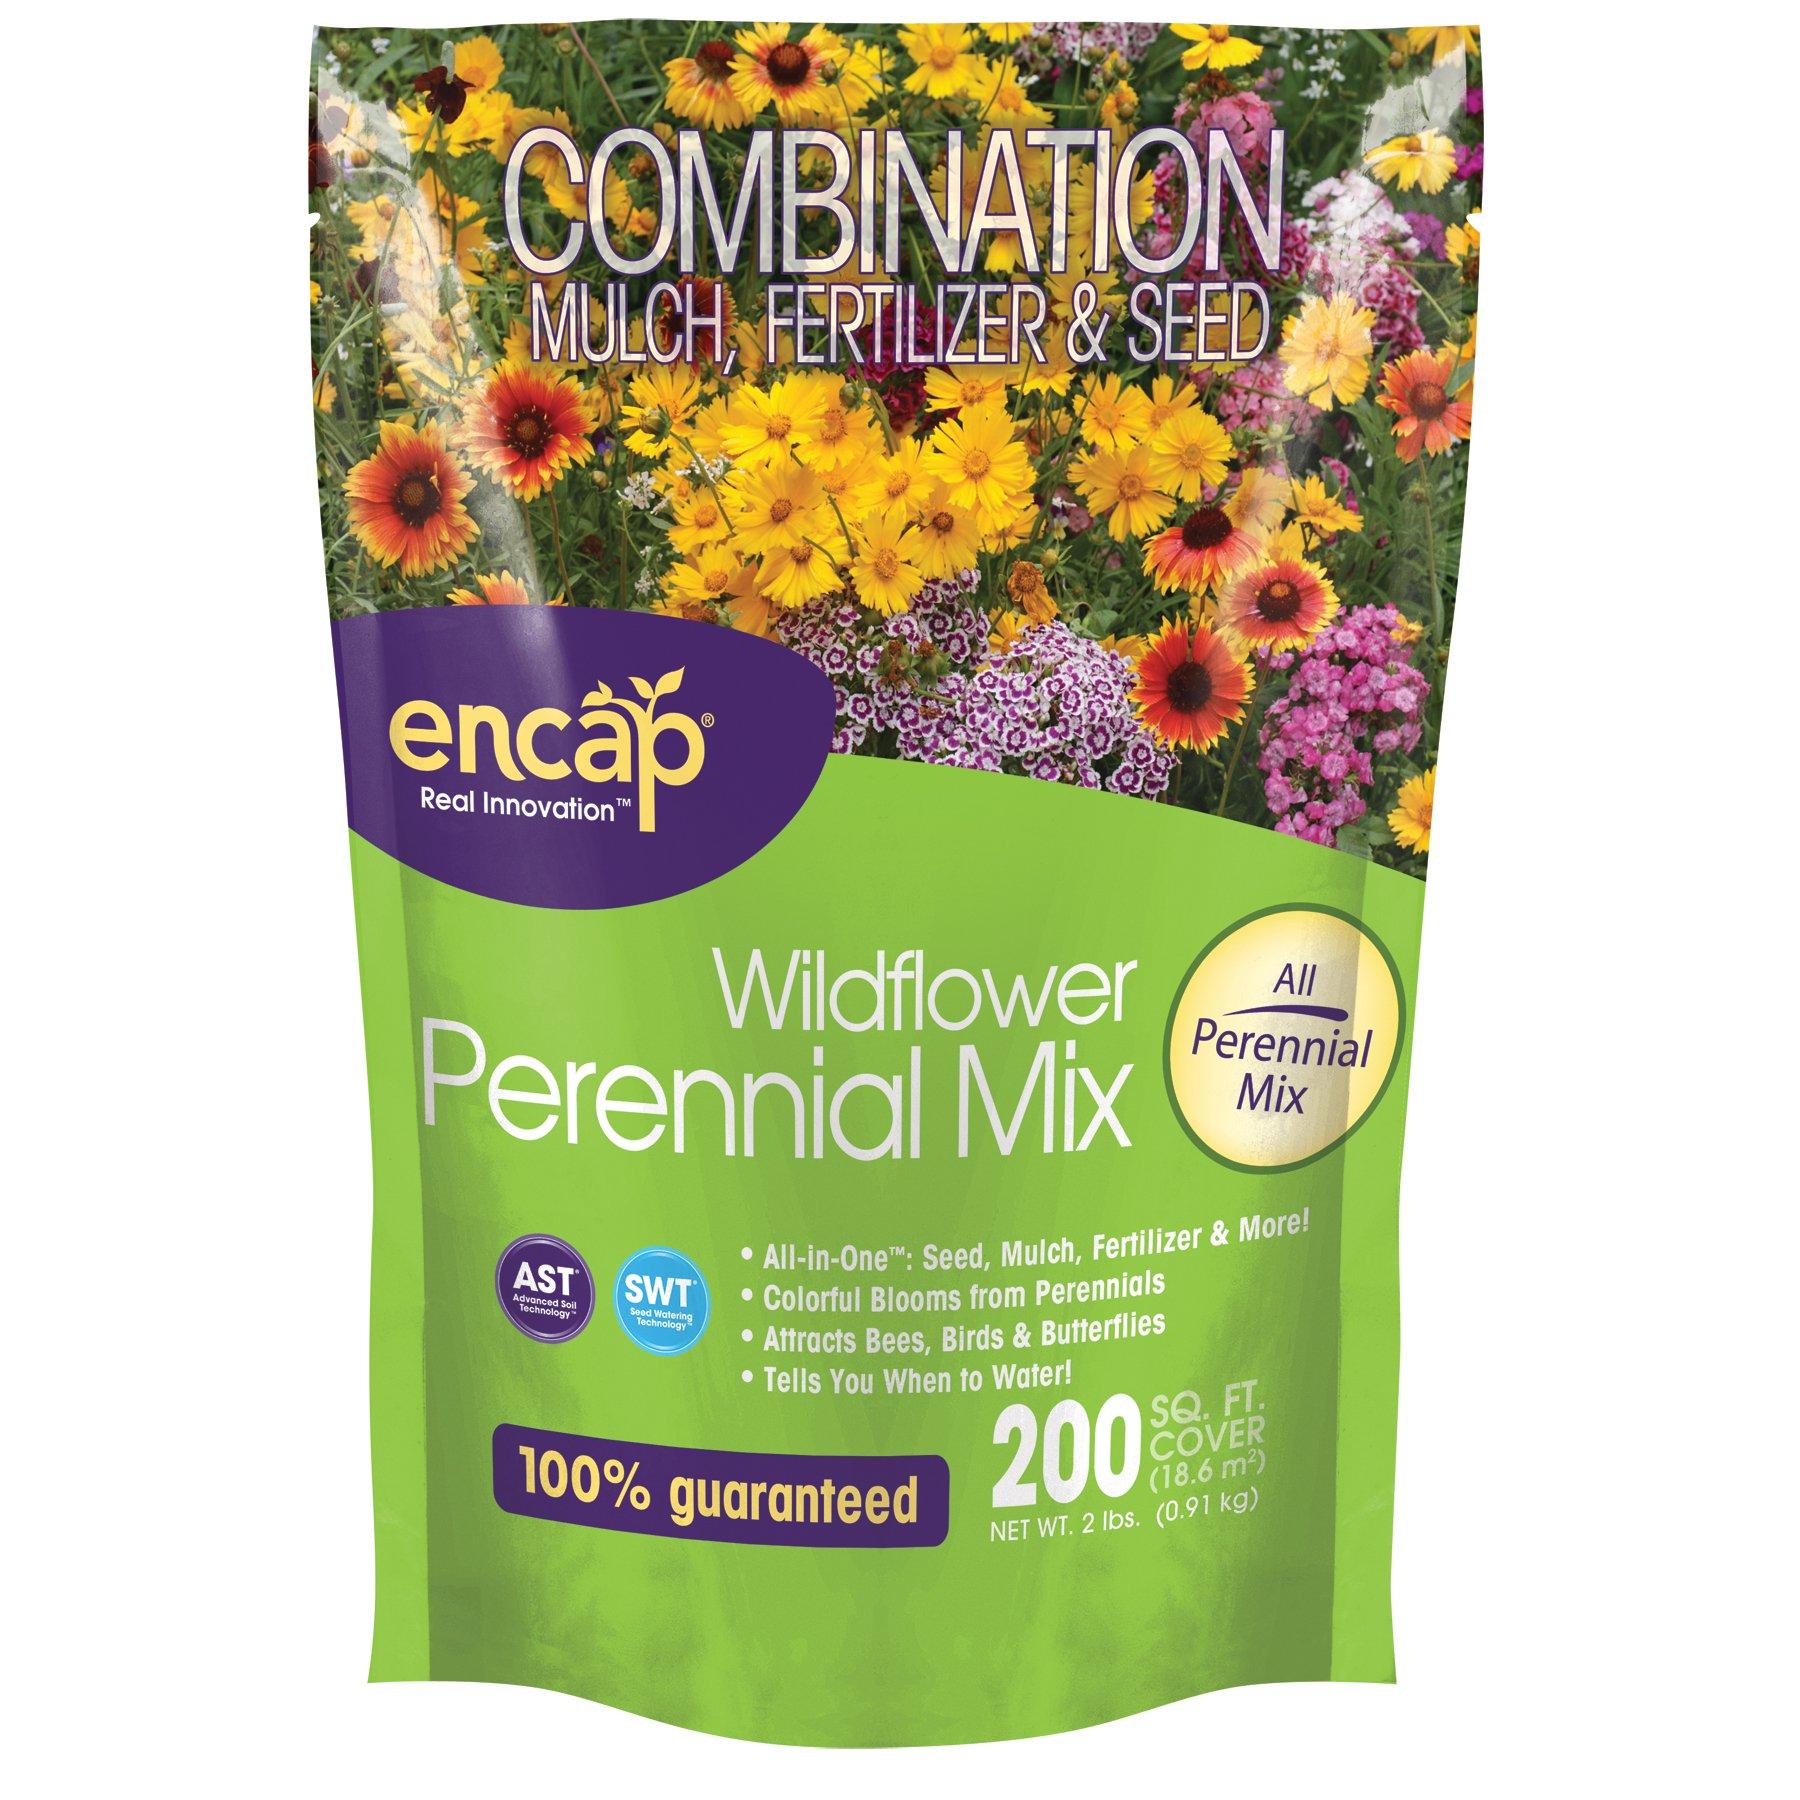 ENCAP 11520-6 2 lb Wildflowers Perennial